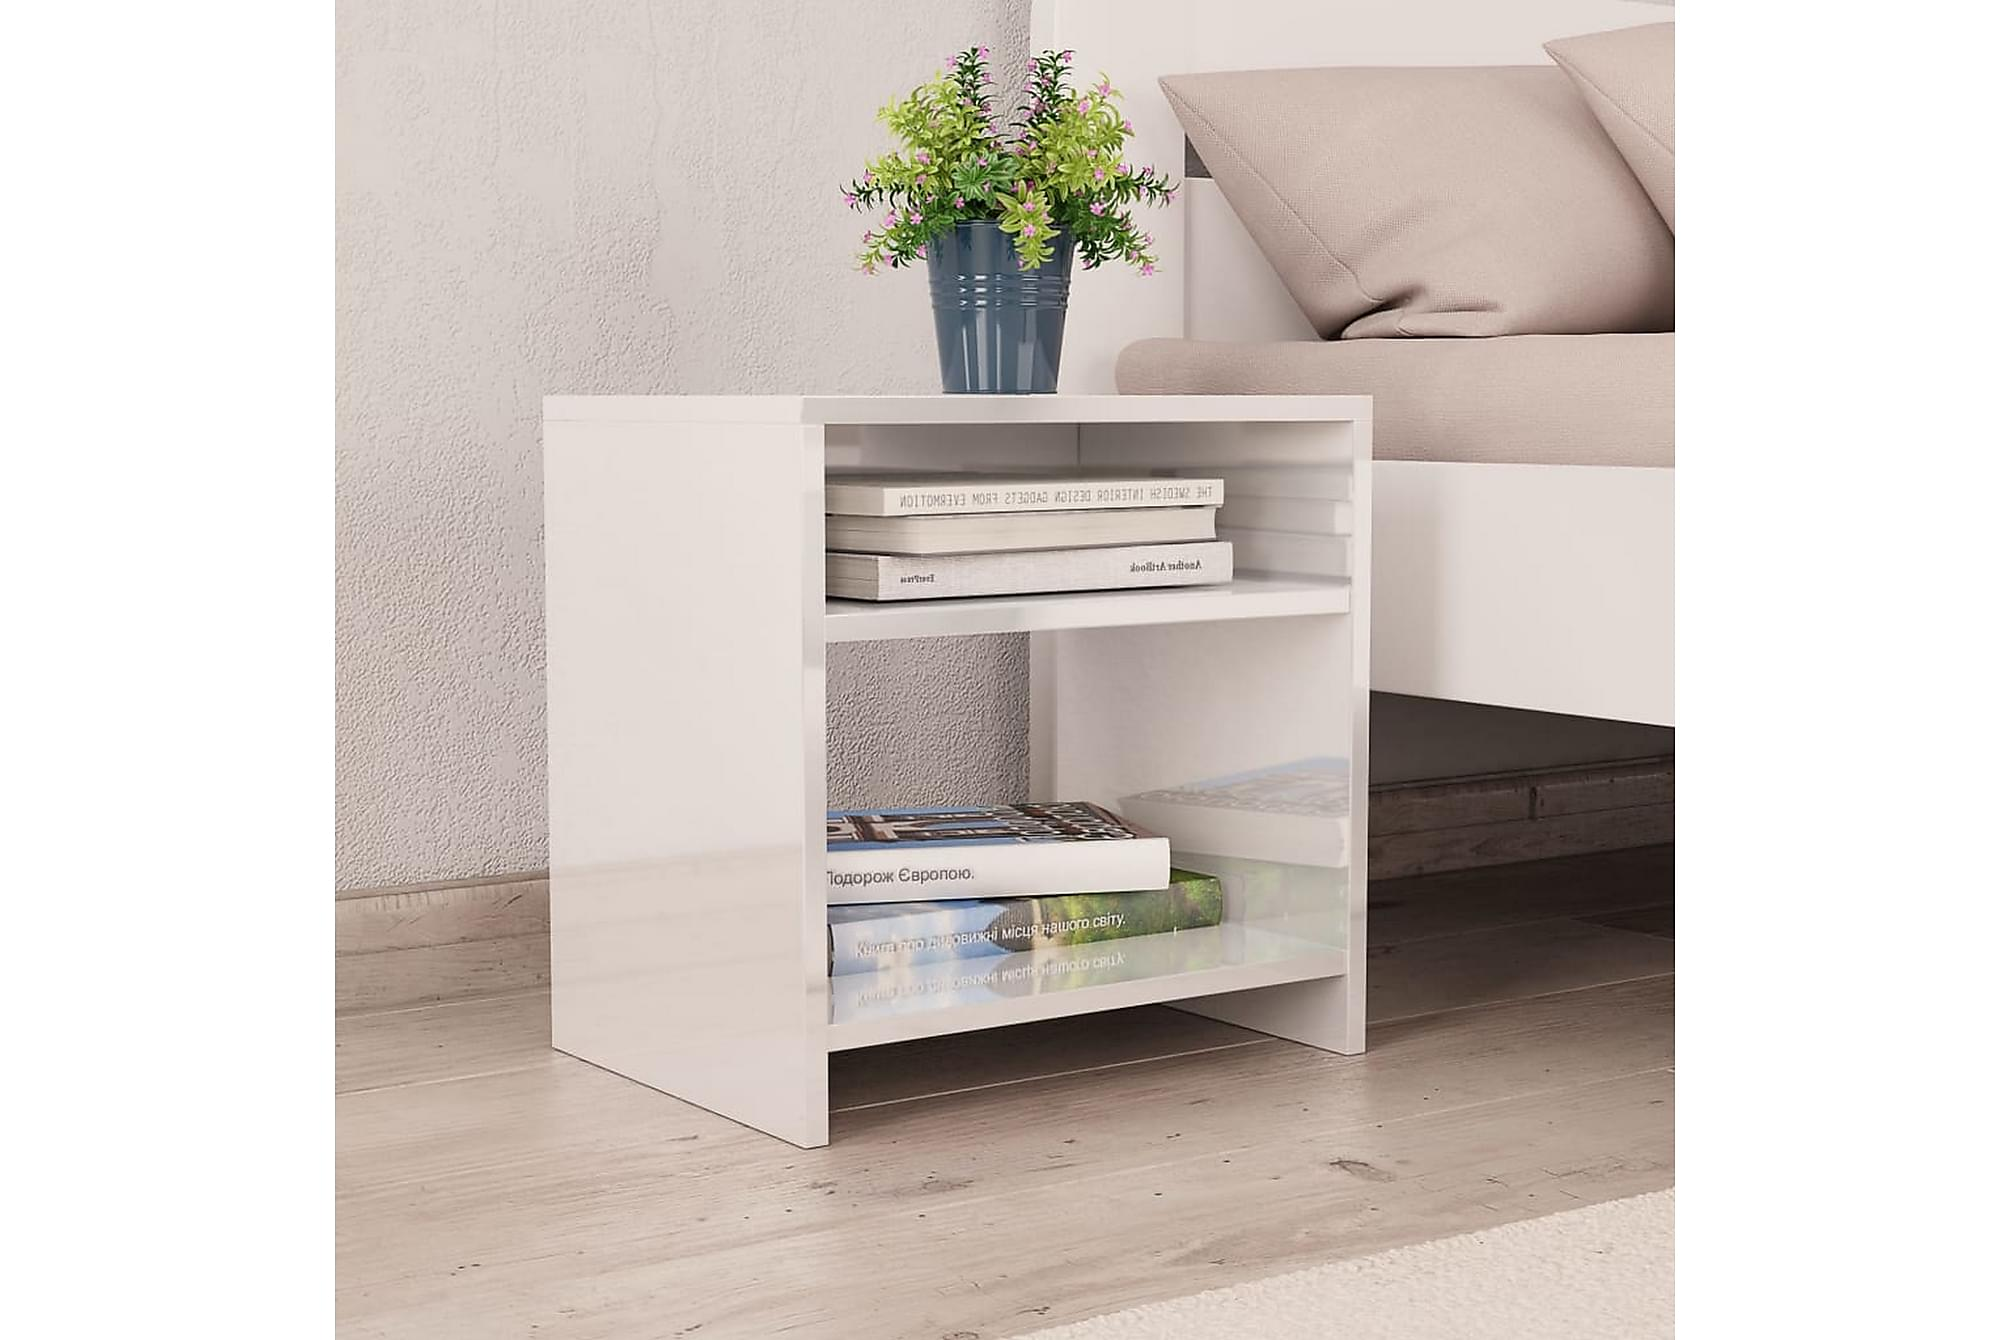 Sängbord 2 st vit högglans 40x30x40 cm spånskiva